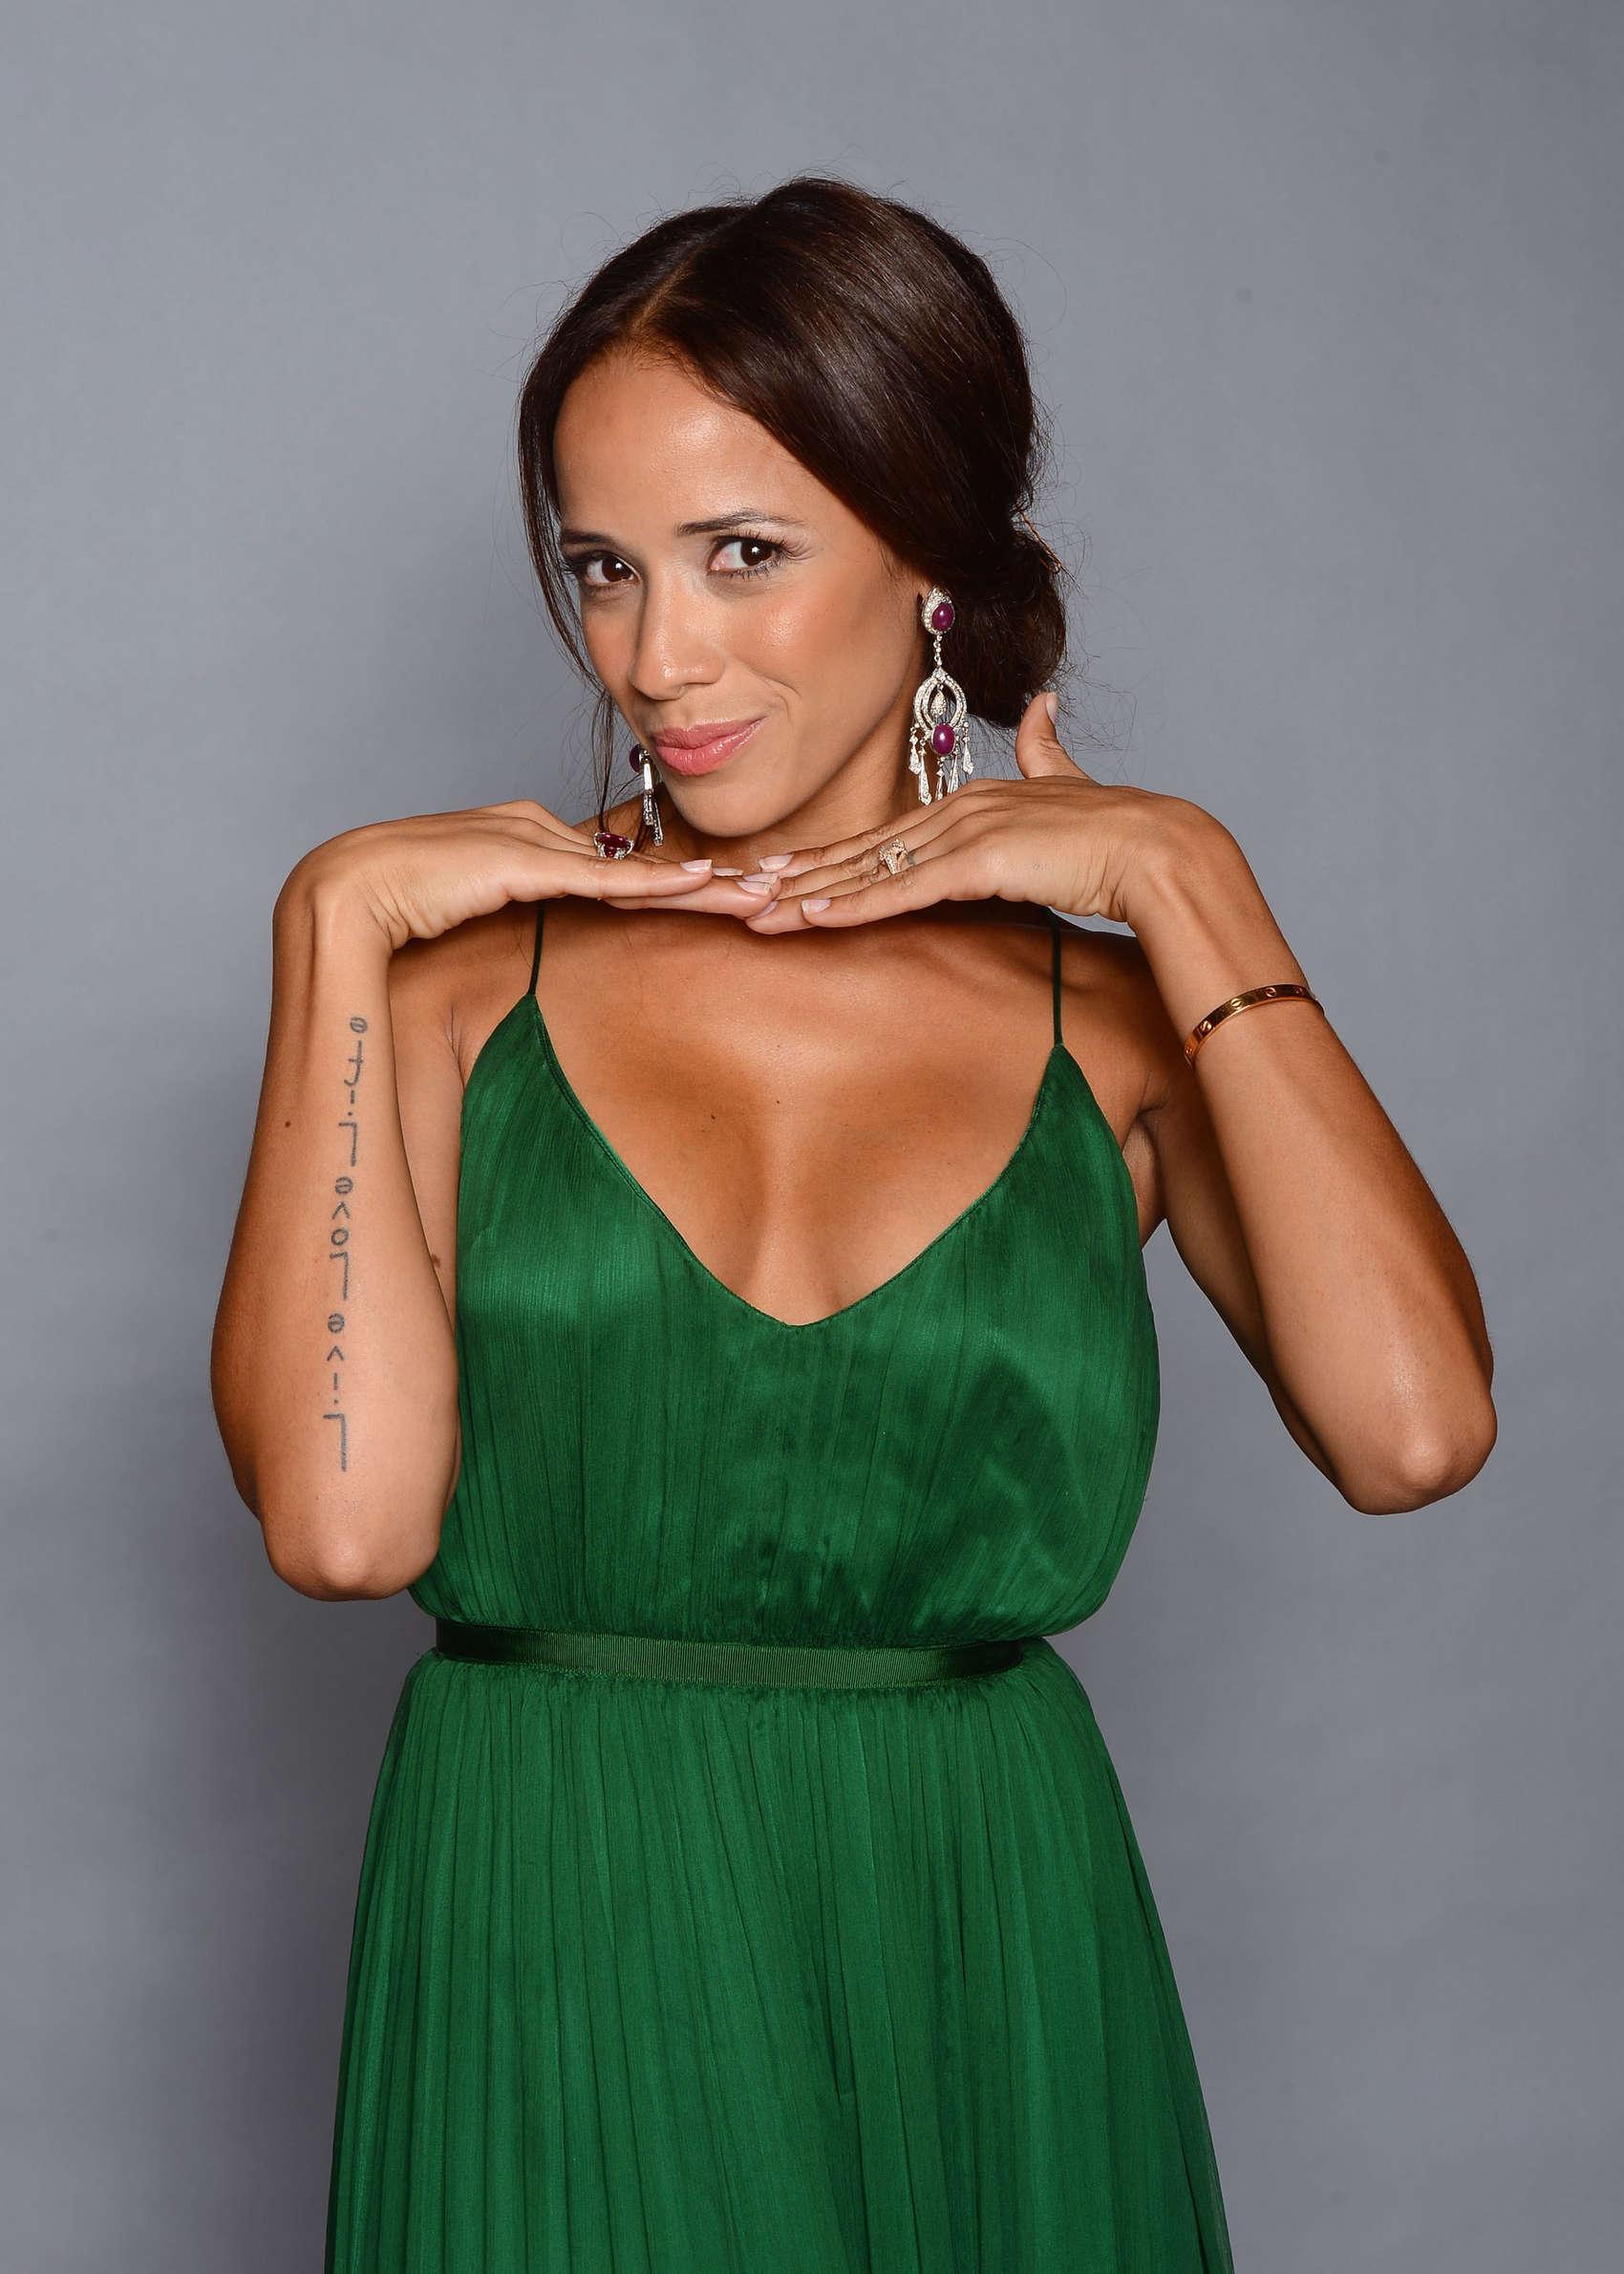 Dania Ramirez Cleavage nude 802